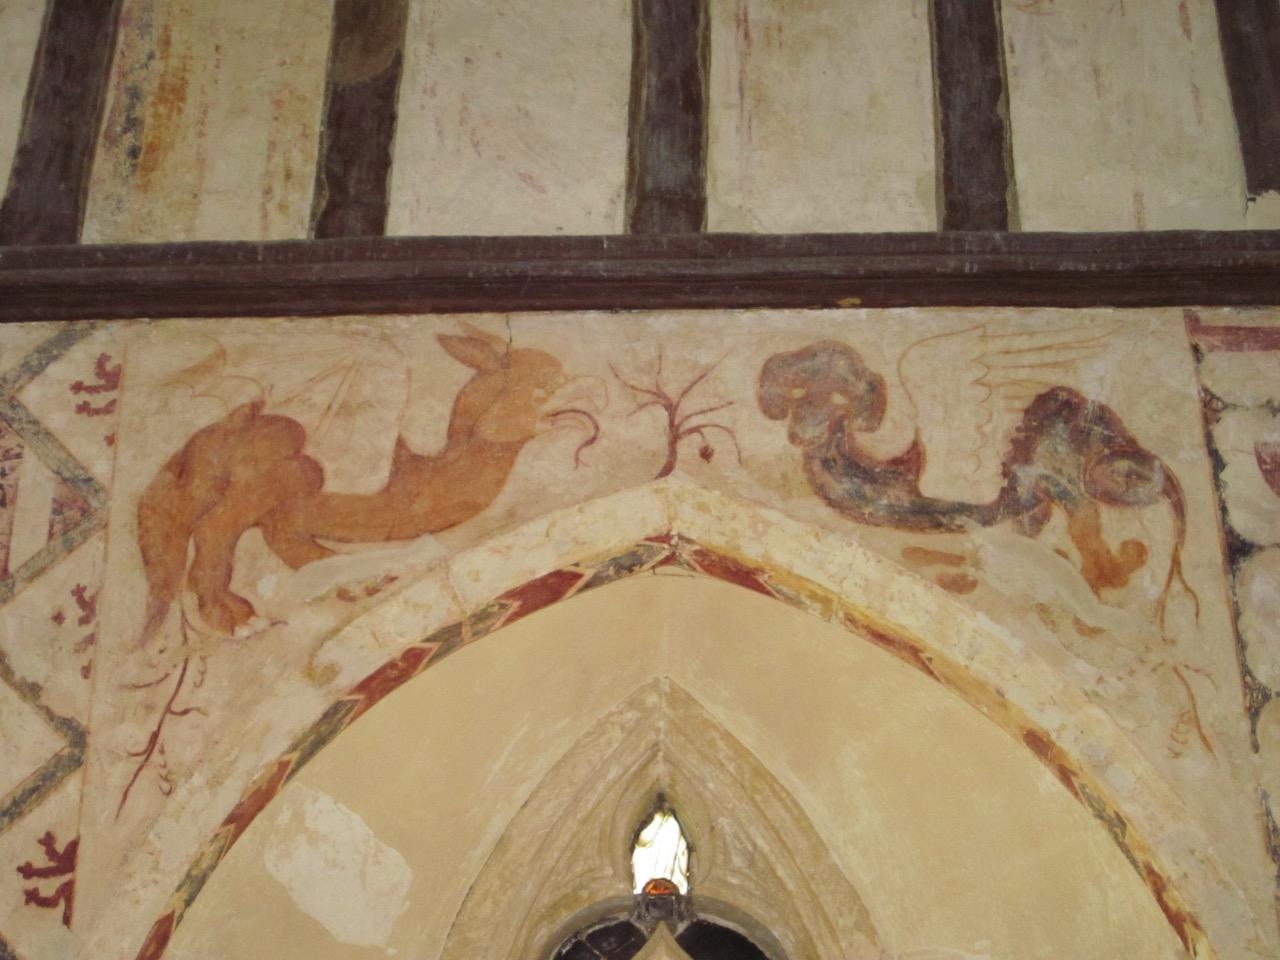 Wall frescoes, mythological beasts (13th cent.)